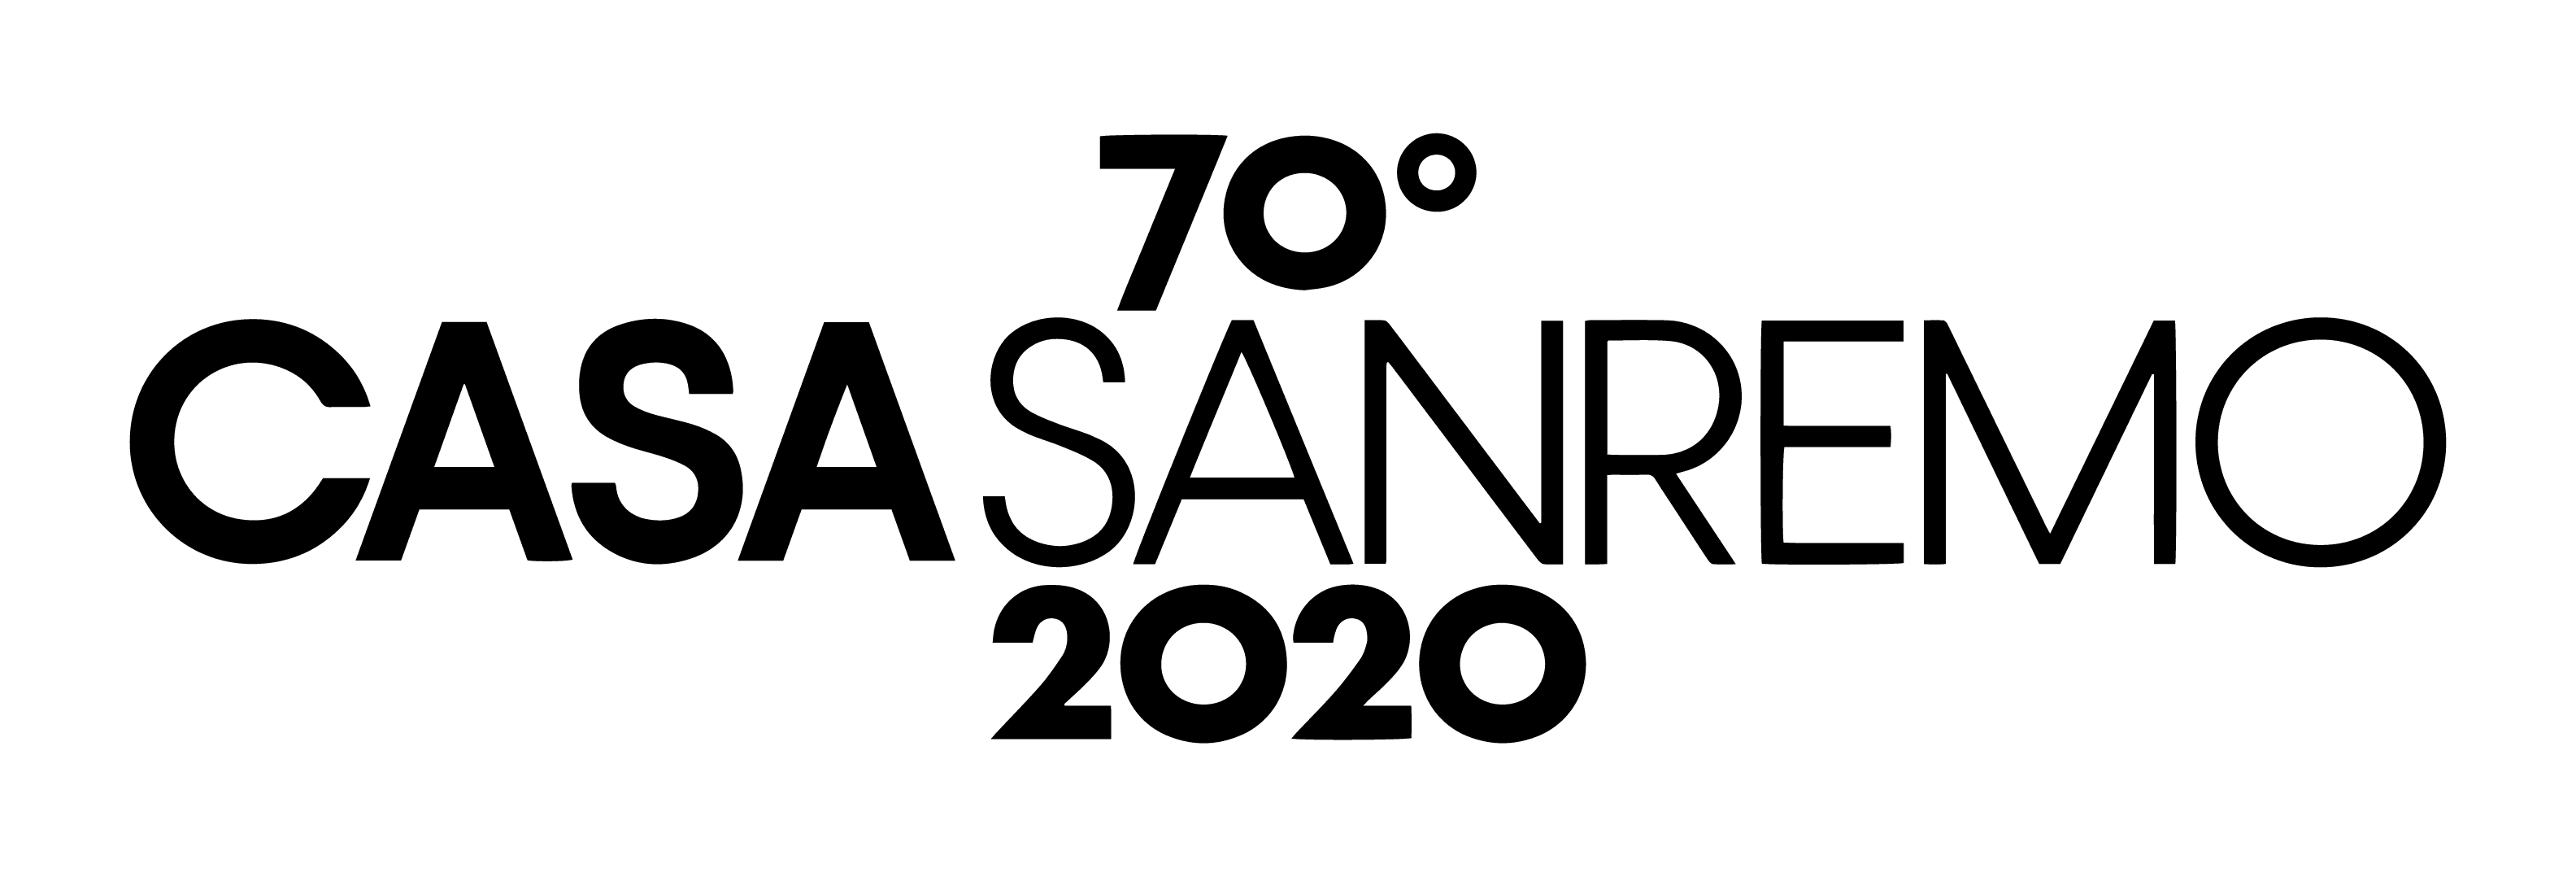 La Gianluca Mech Sponsor di Casa Sanremo 2020 con un